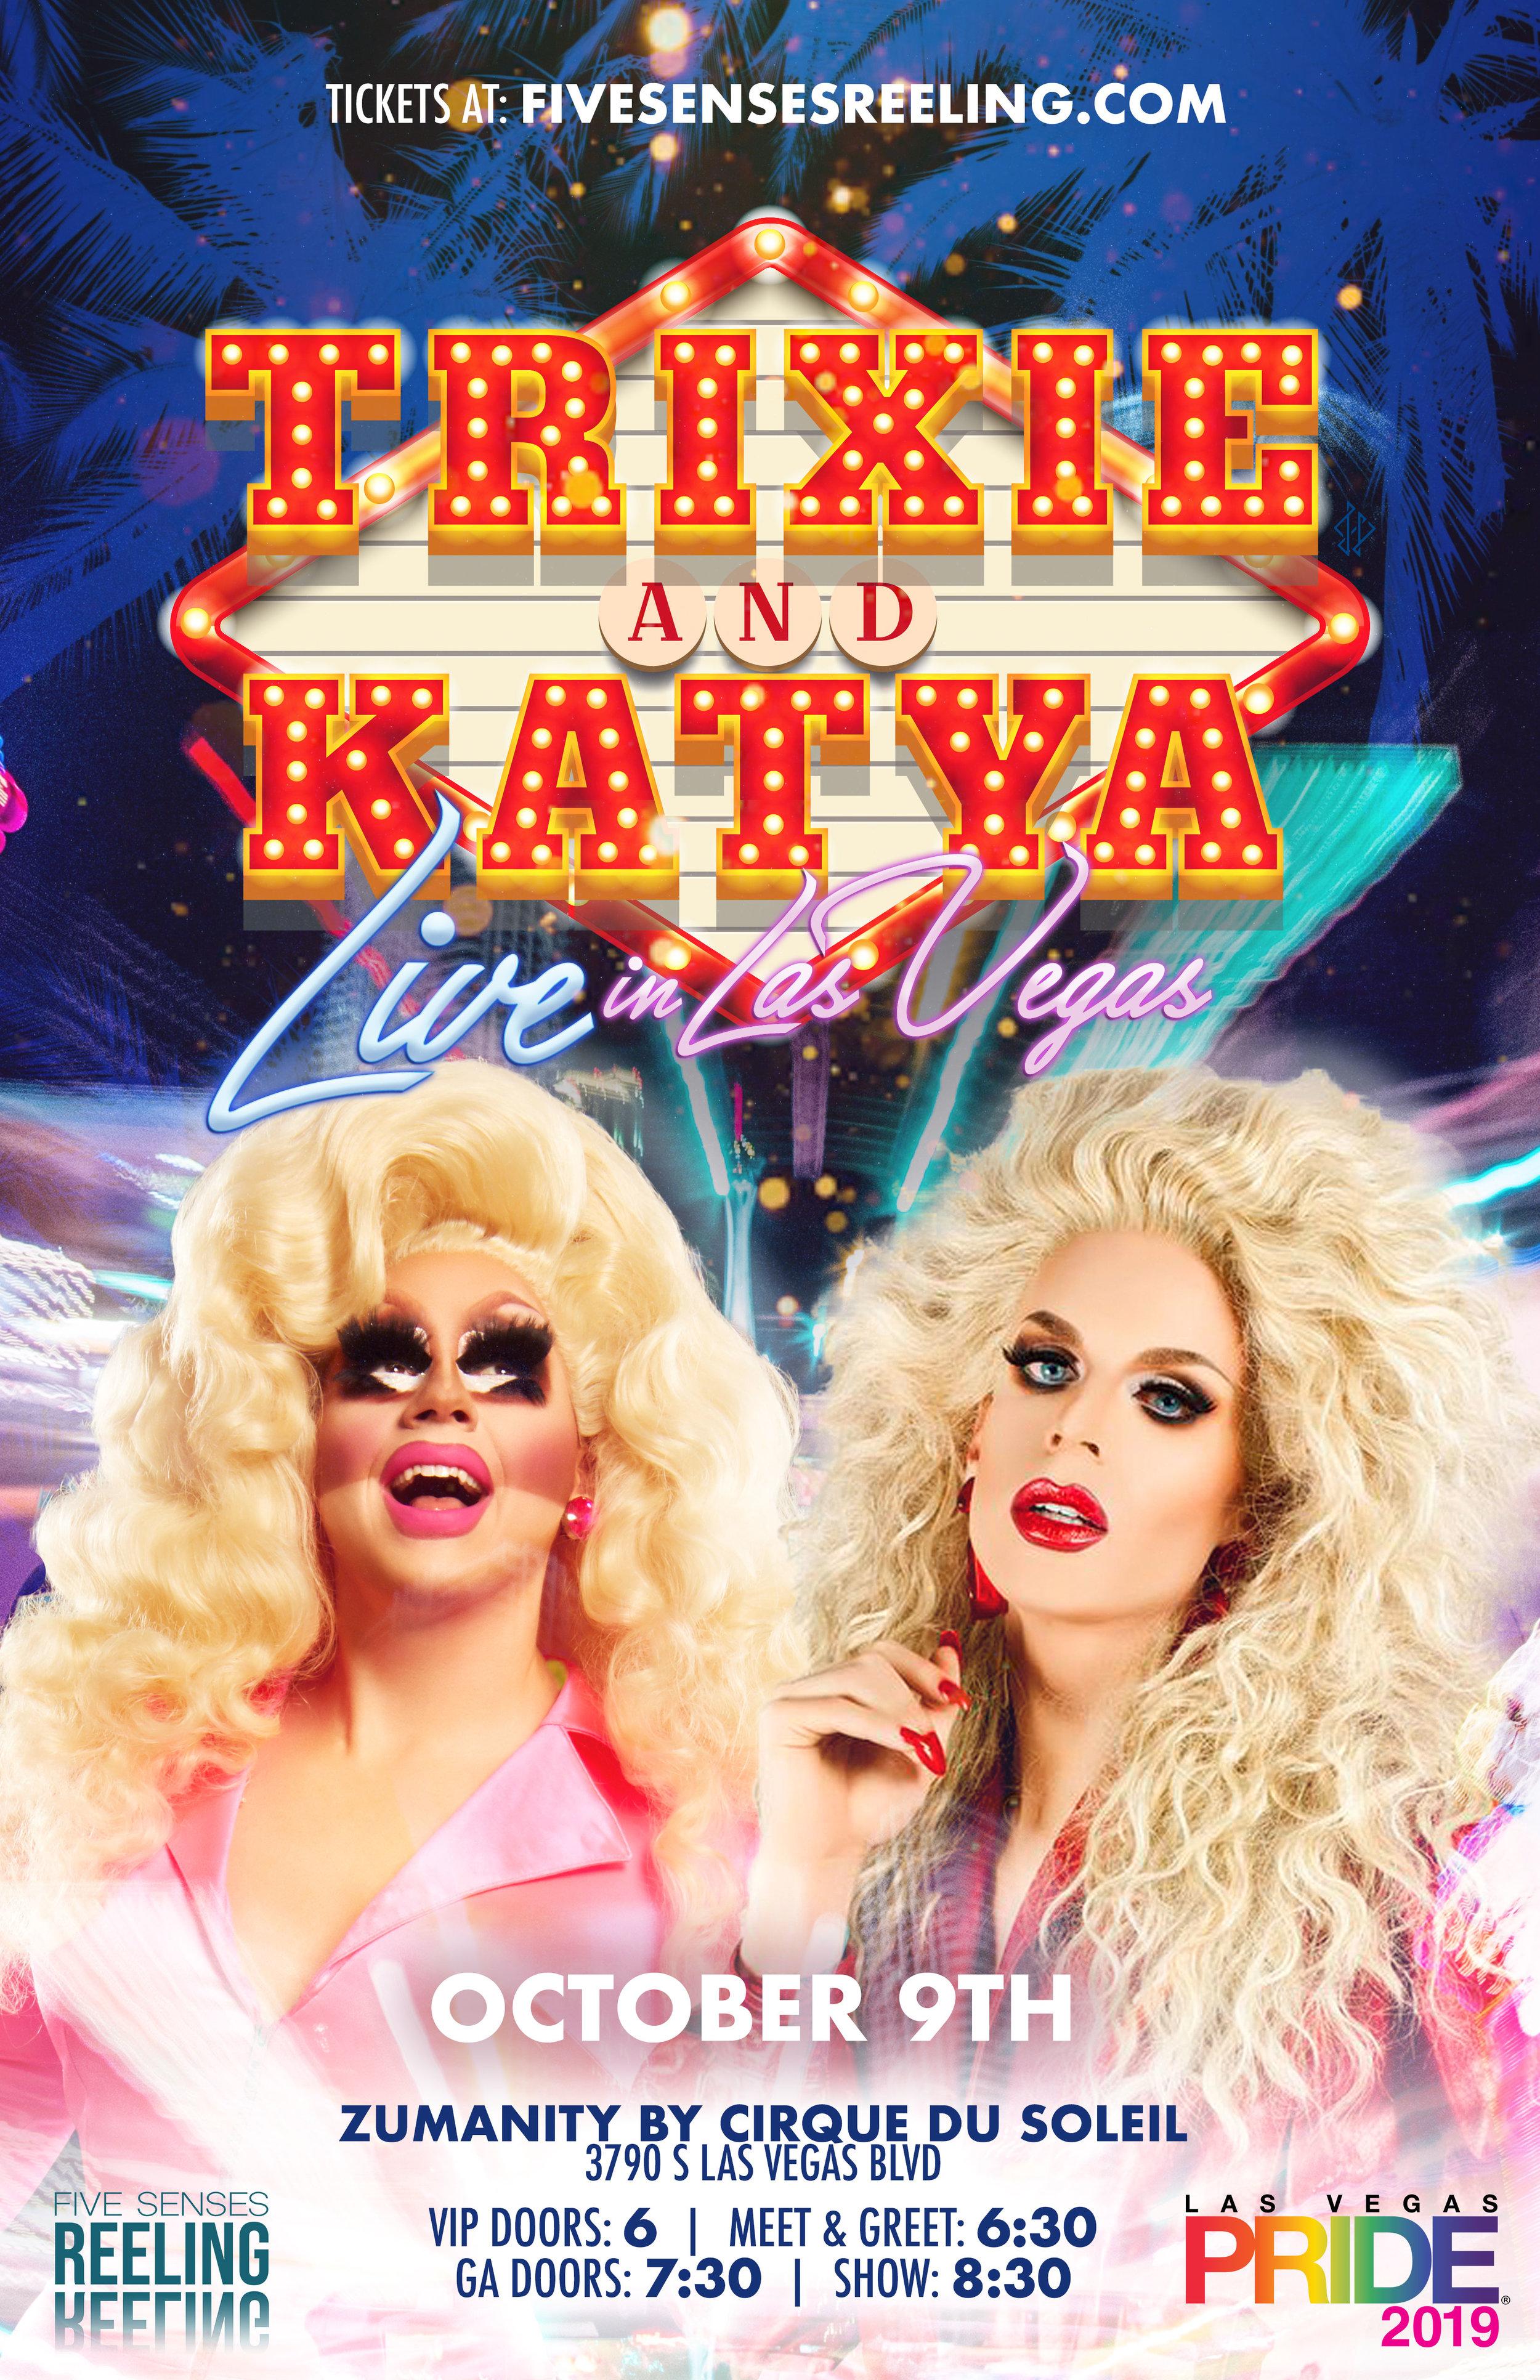 Trixie-and-Katya-Live-Vegas-11x17-Poster.jpg